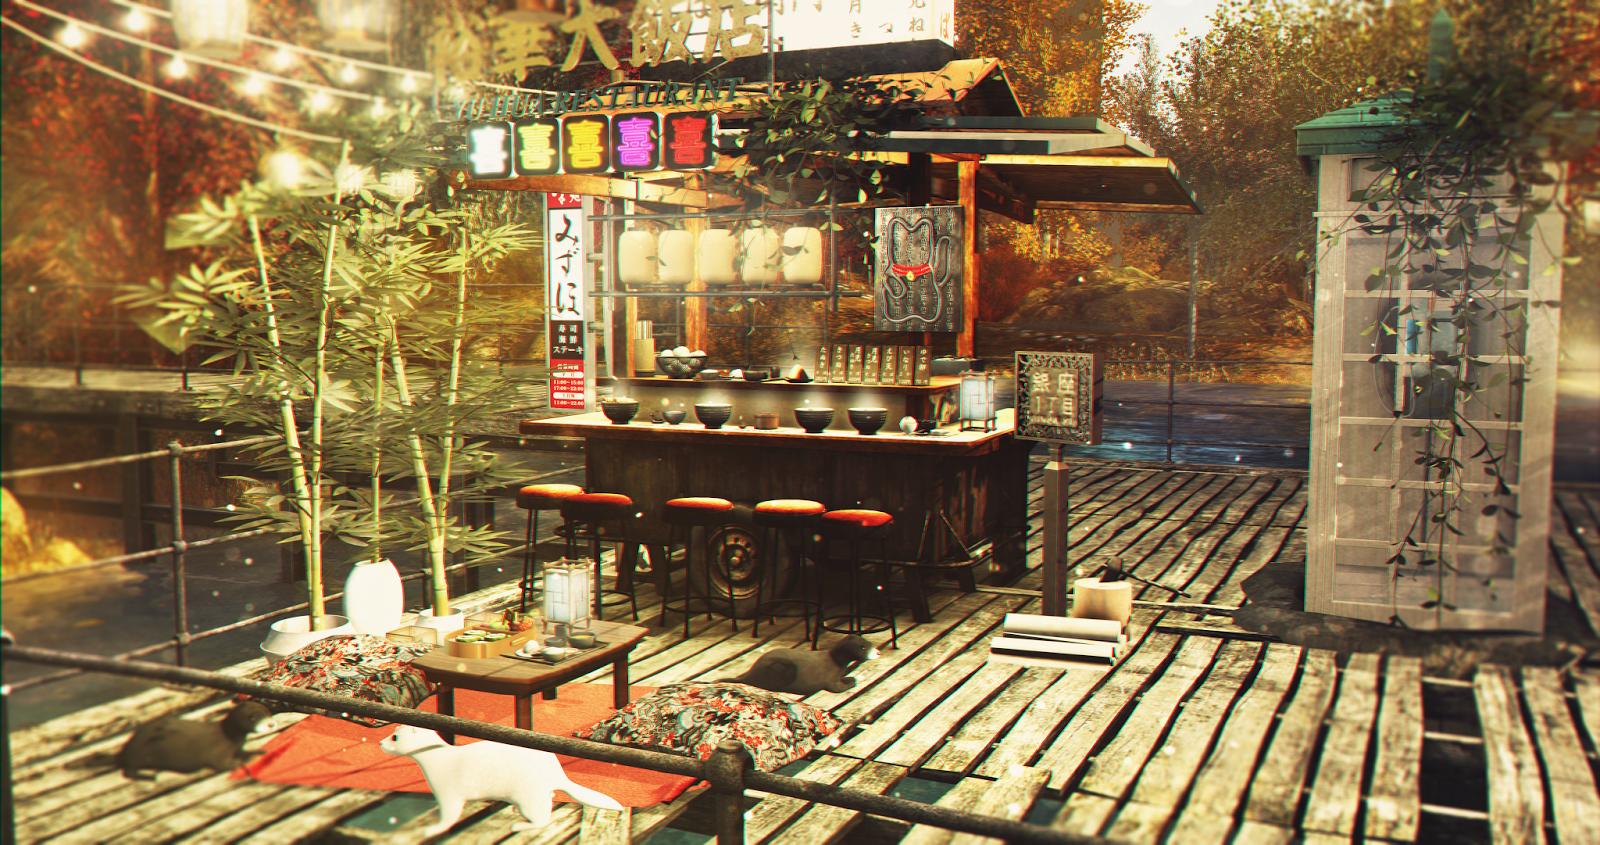 LOTD 456 Tokyo Yakisoba...